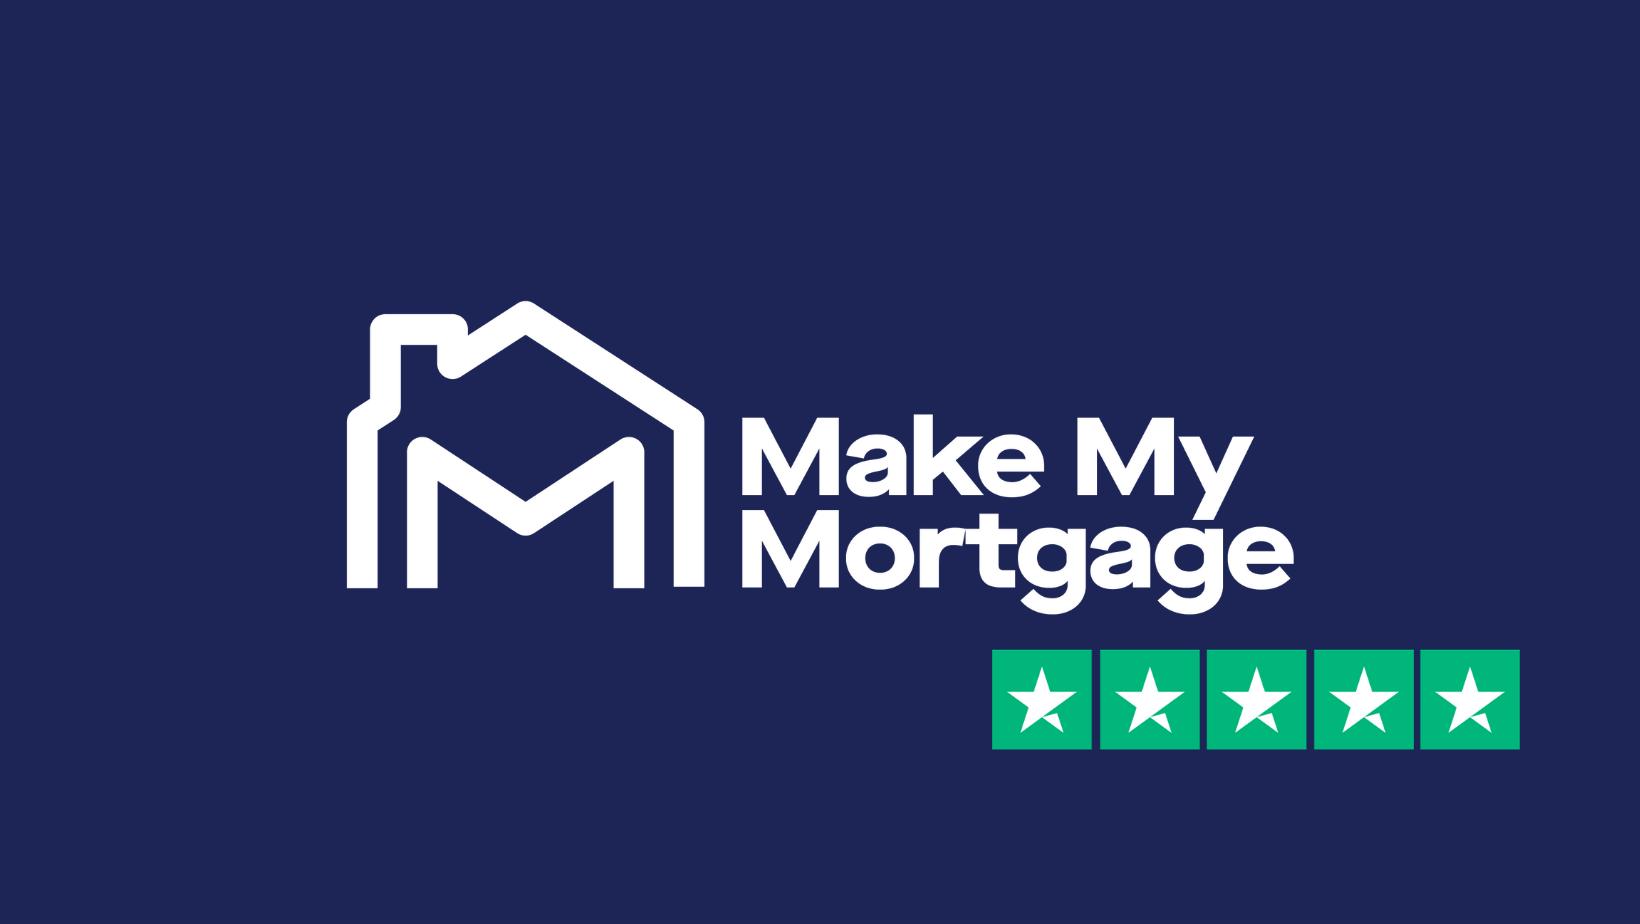 Meet BLOWN business Make My Mortgage